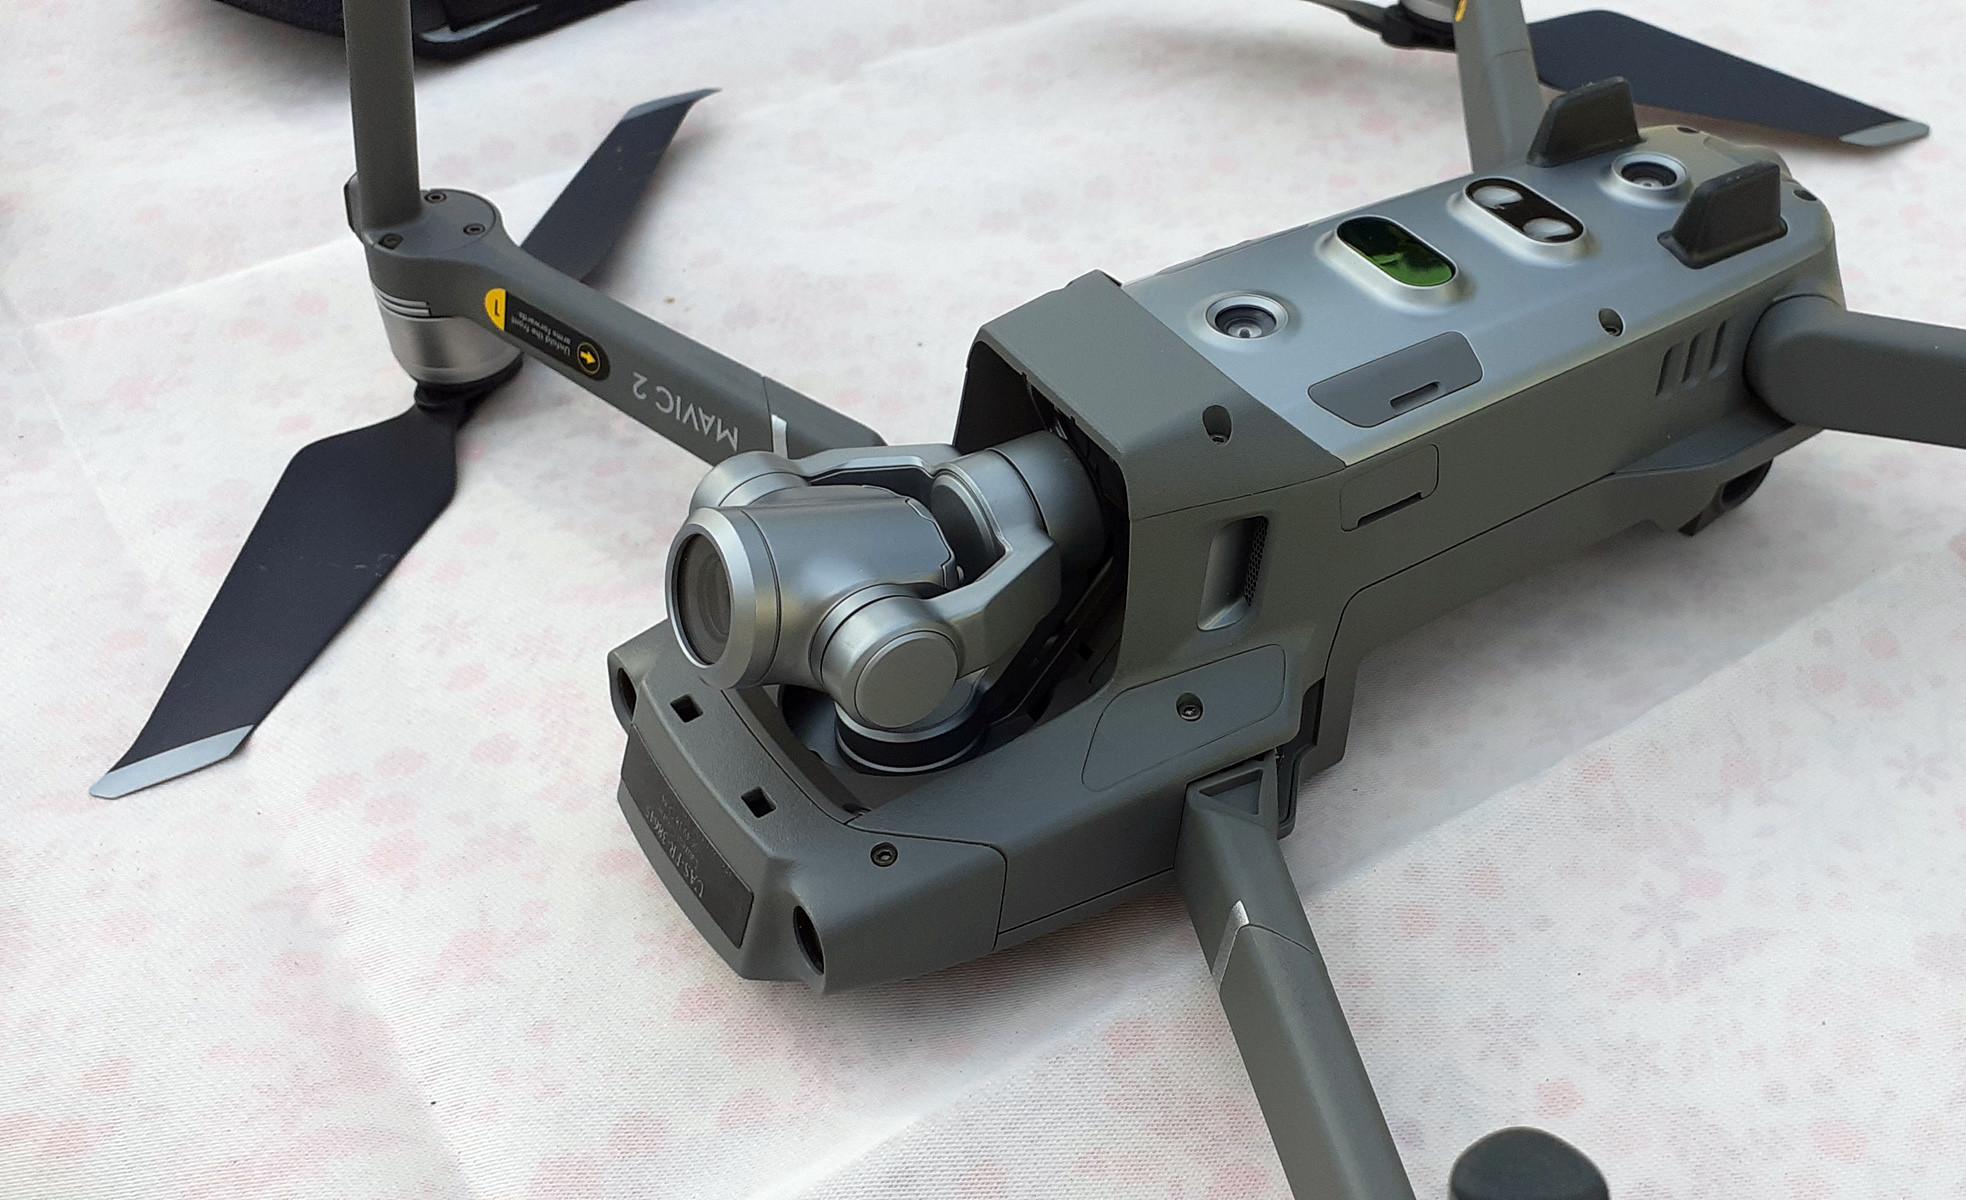 Drone Mavic 2 zoom en très bon état